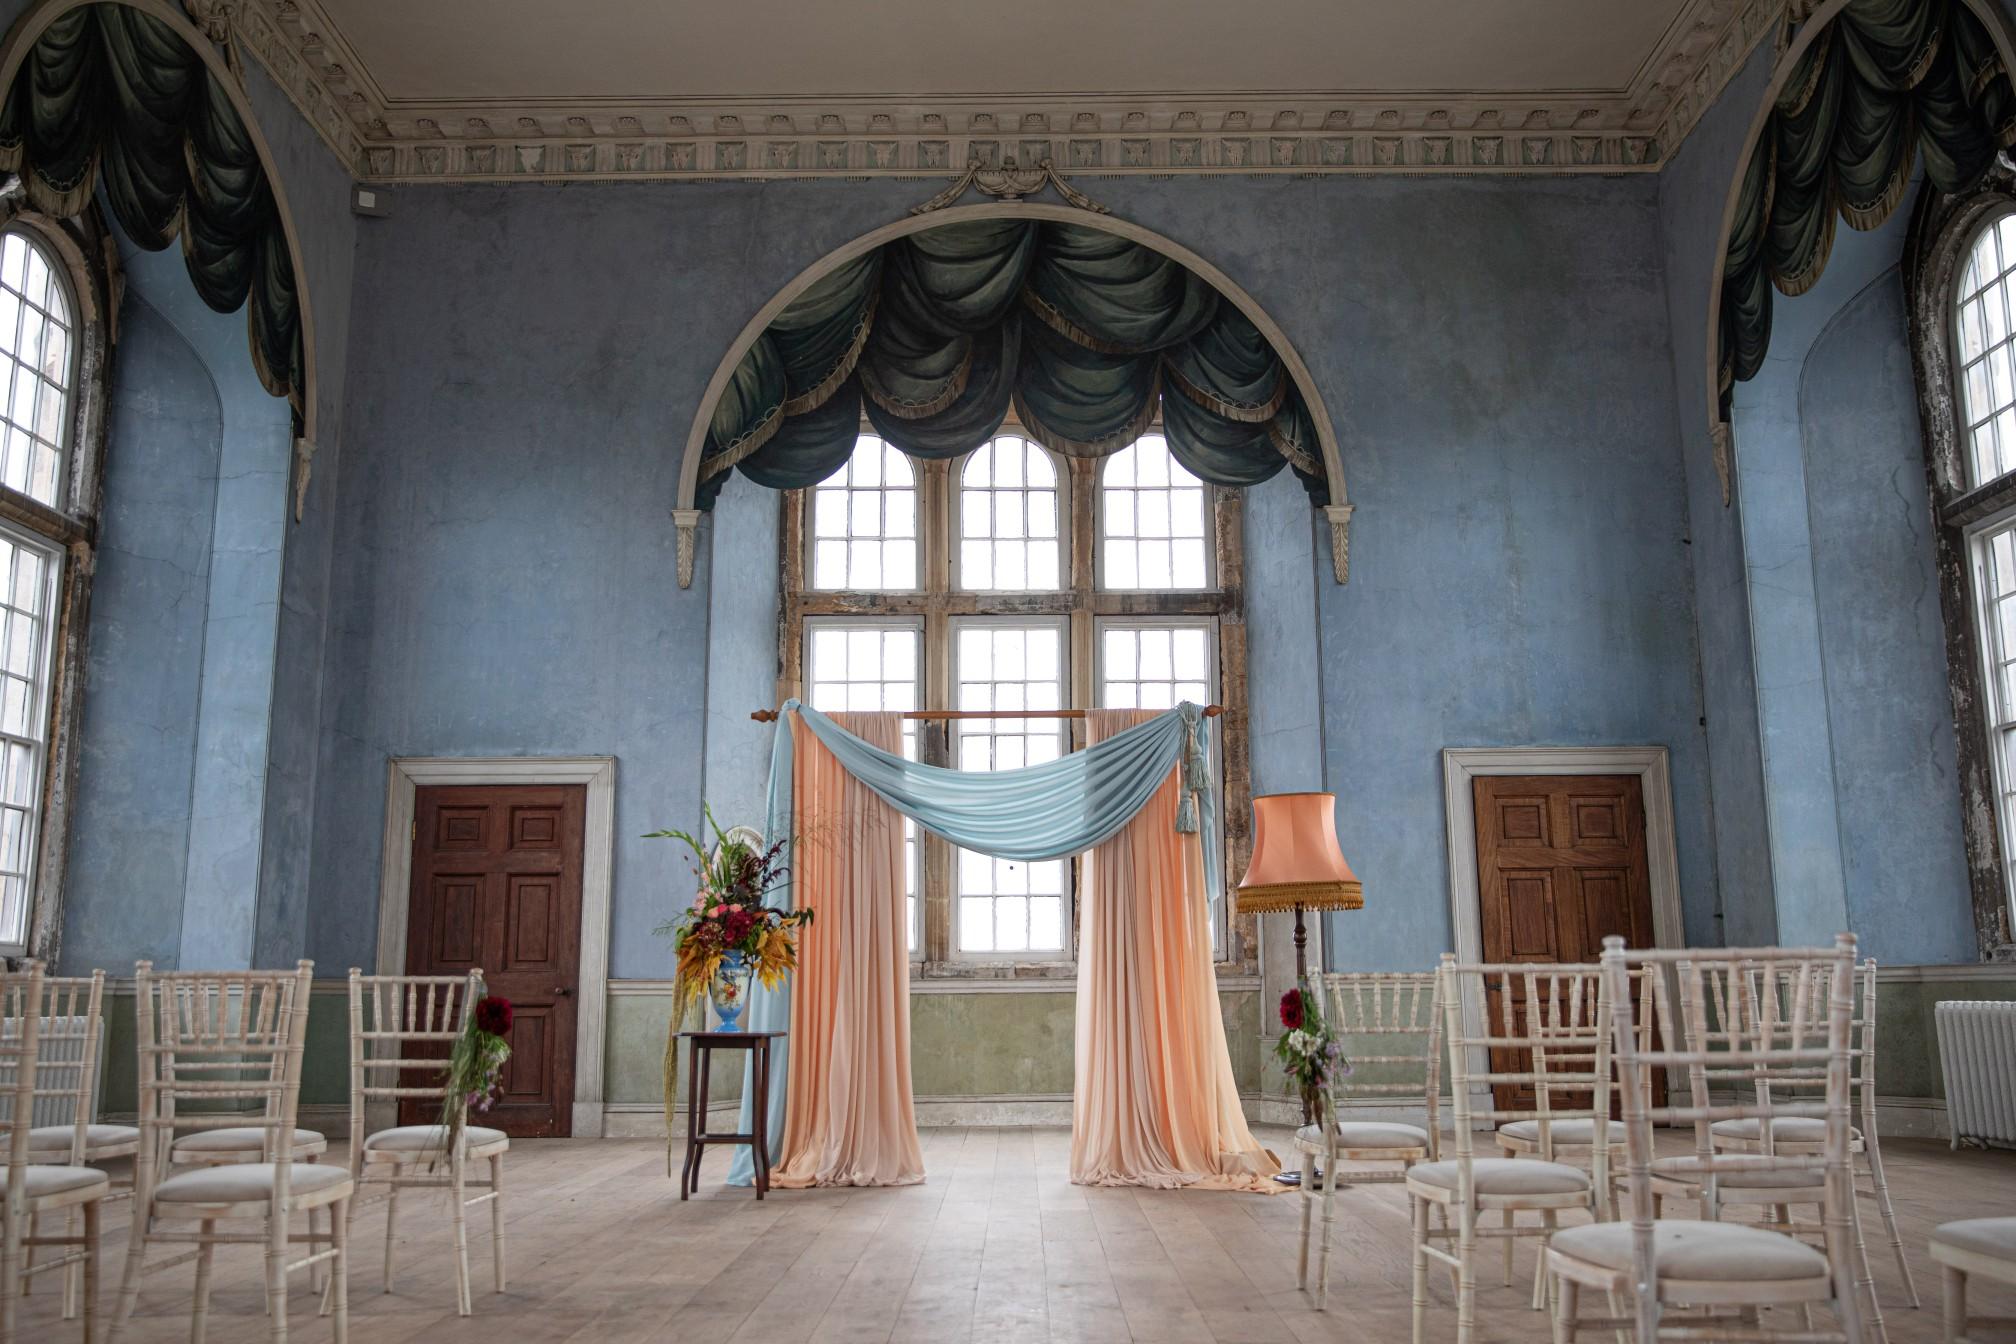 wollaton hall - nottingham wedding venue - unique wedding venue - historic wedding venue